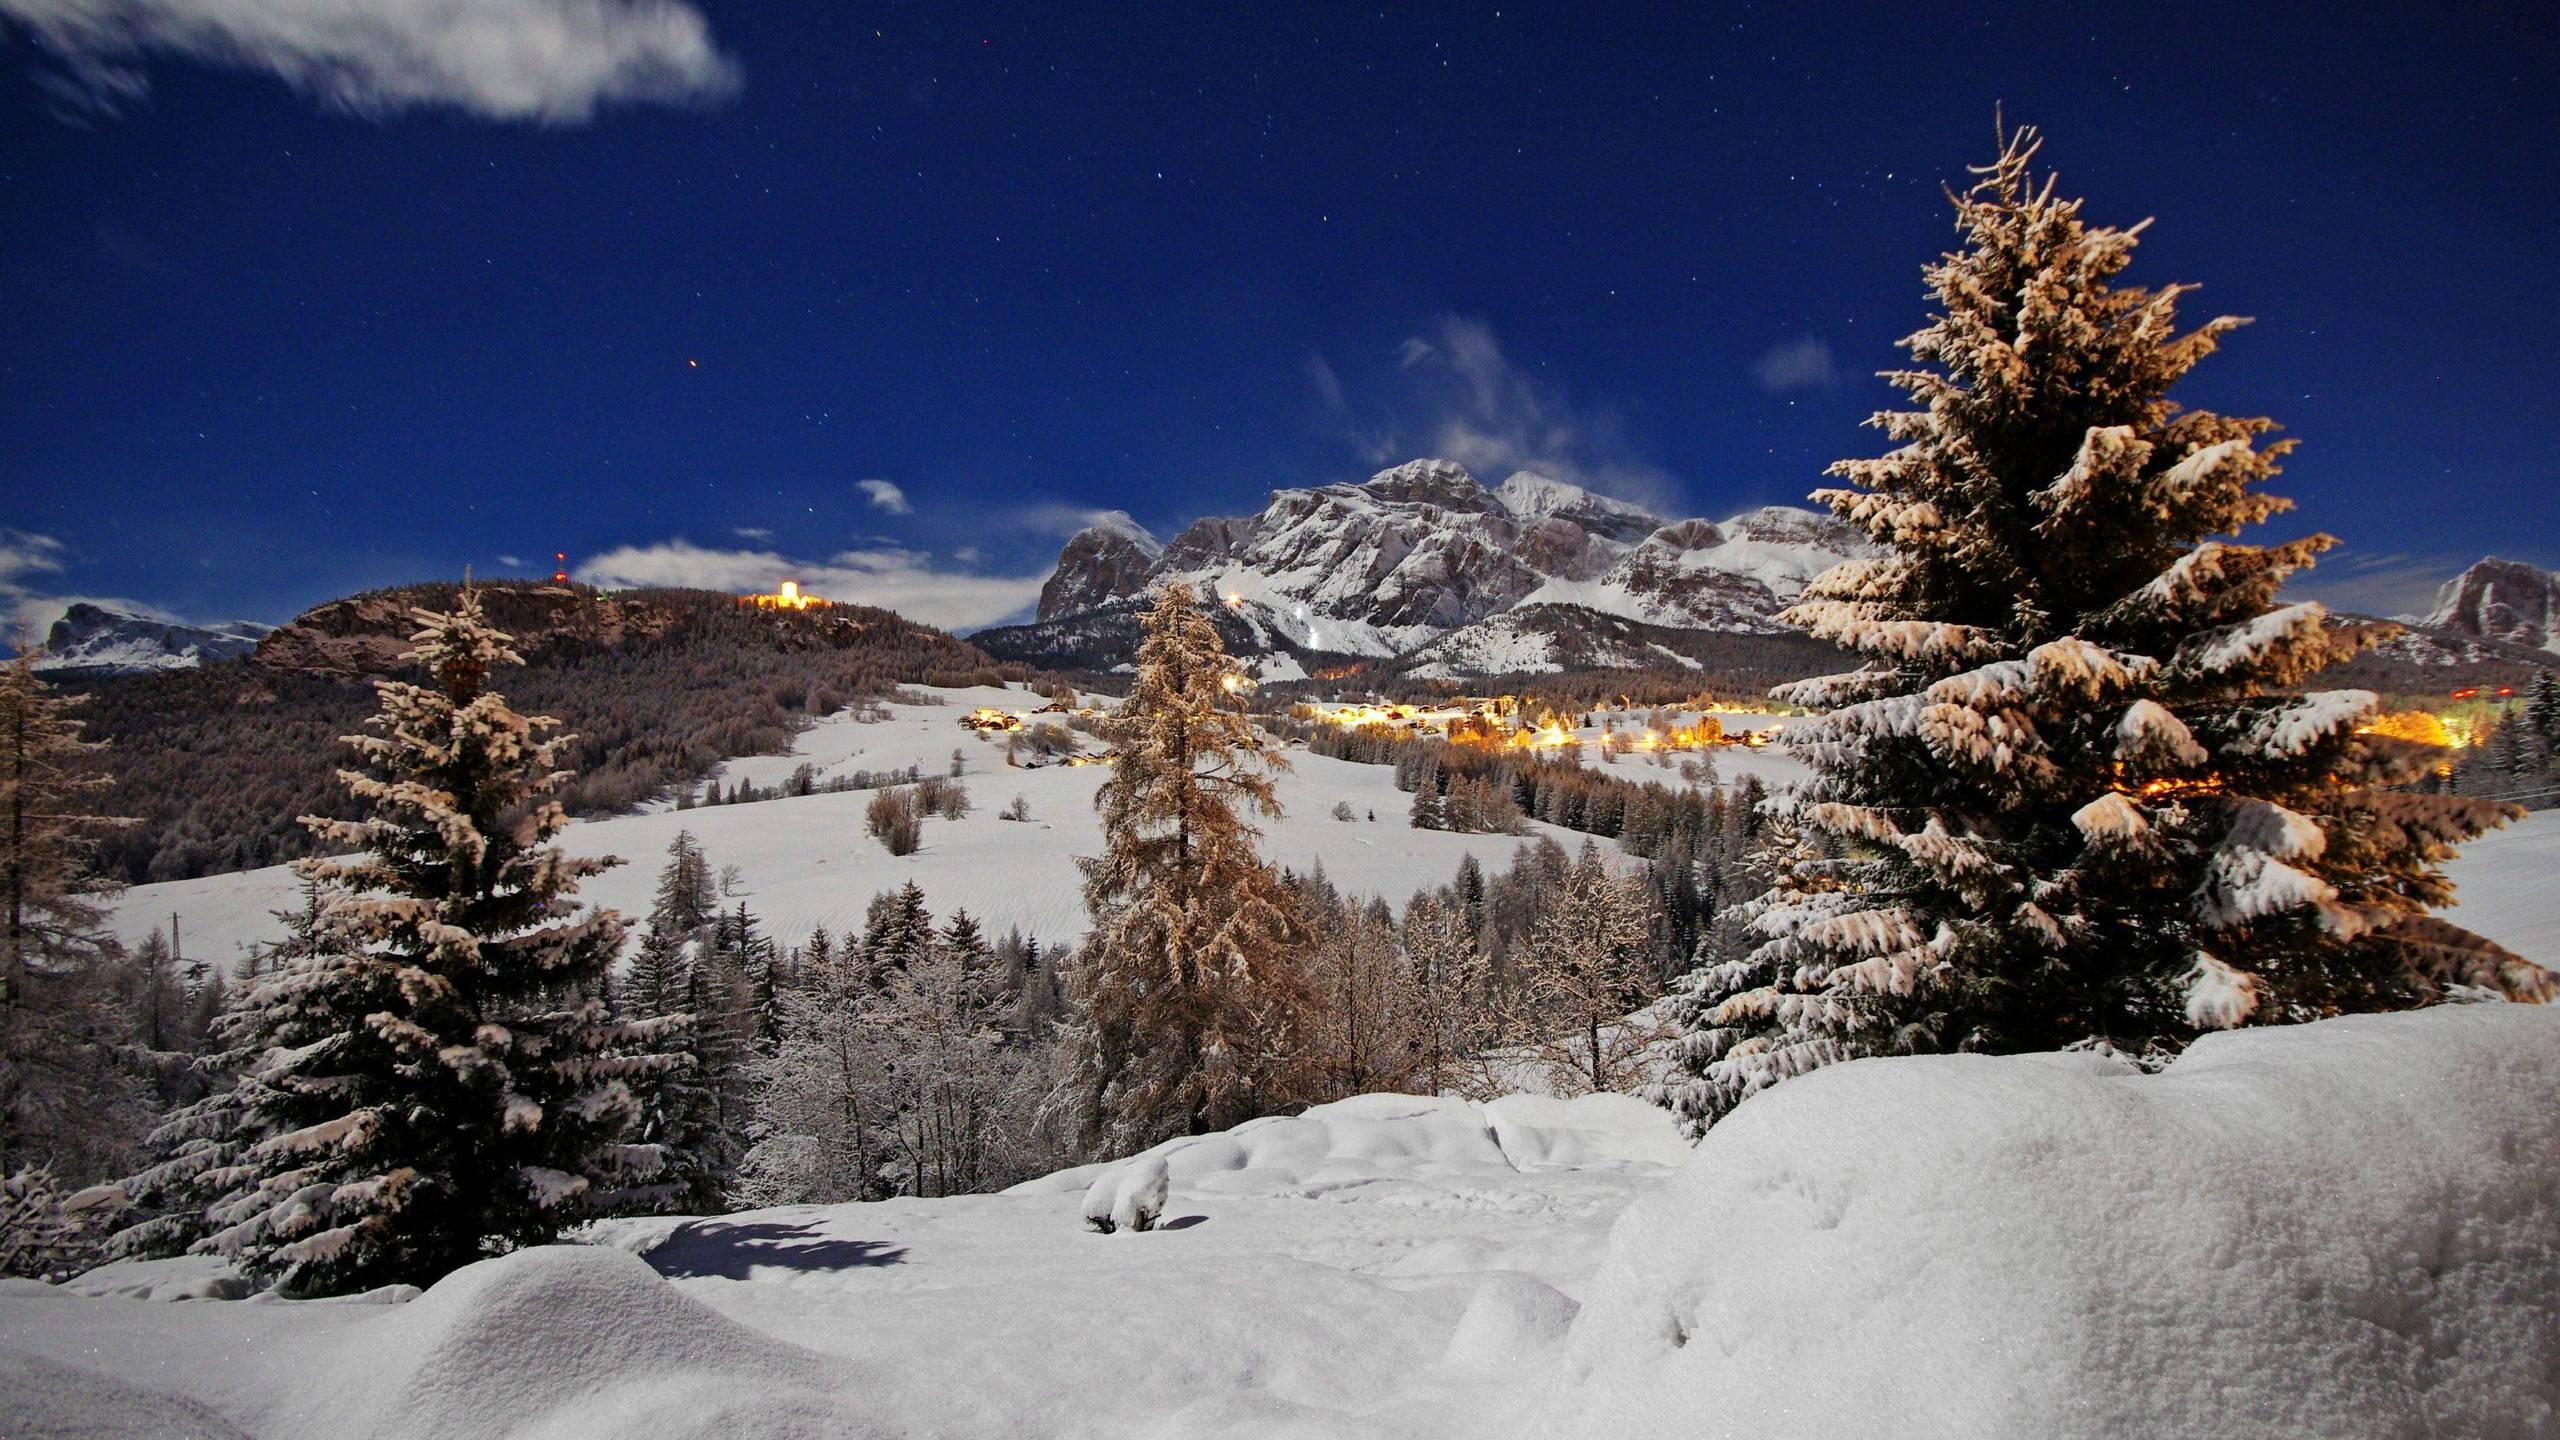 ] Cortina dAmpezzo Full Moon and 2 meters of Snow WQHD Wallpaper 2560x1440